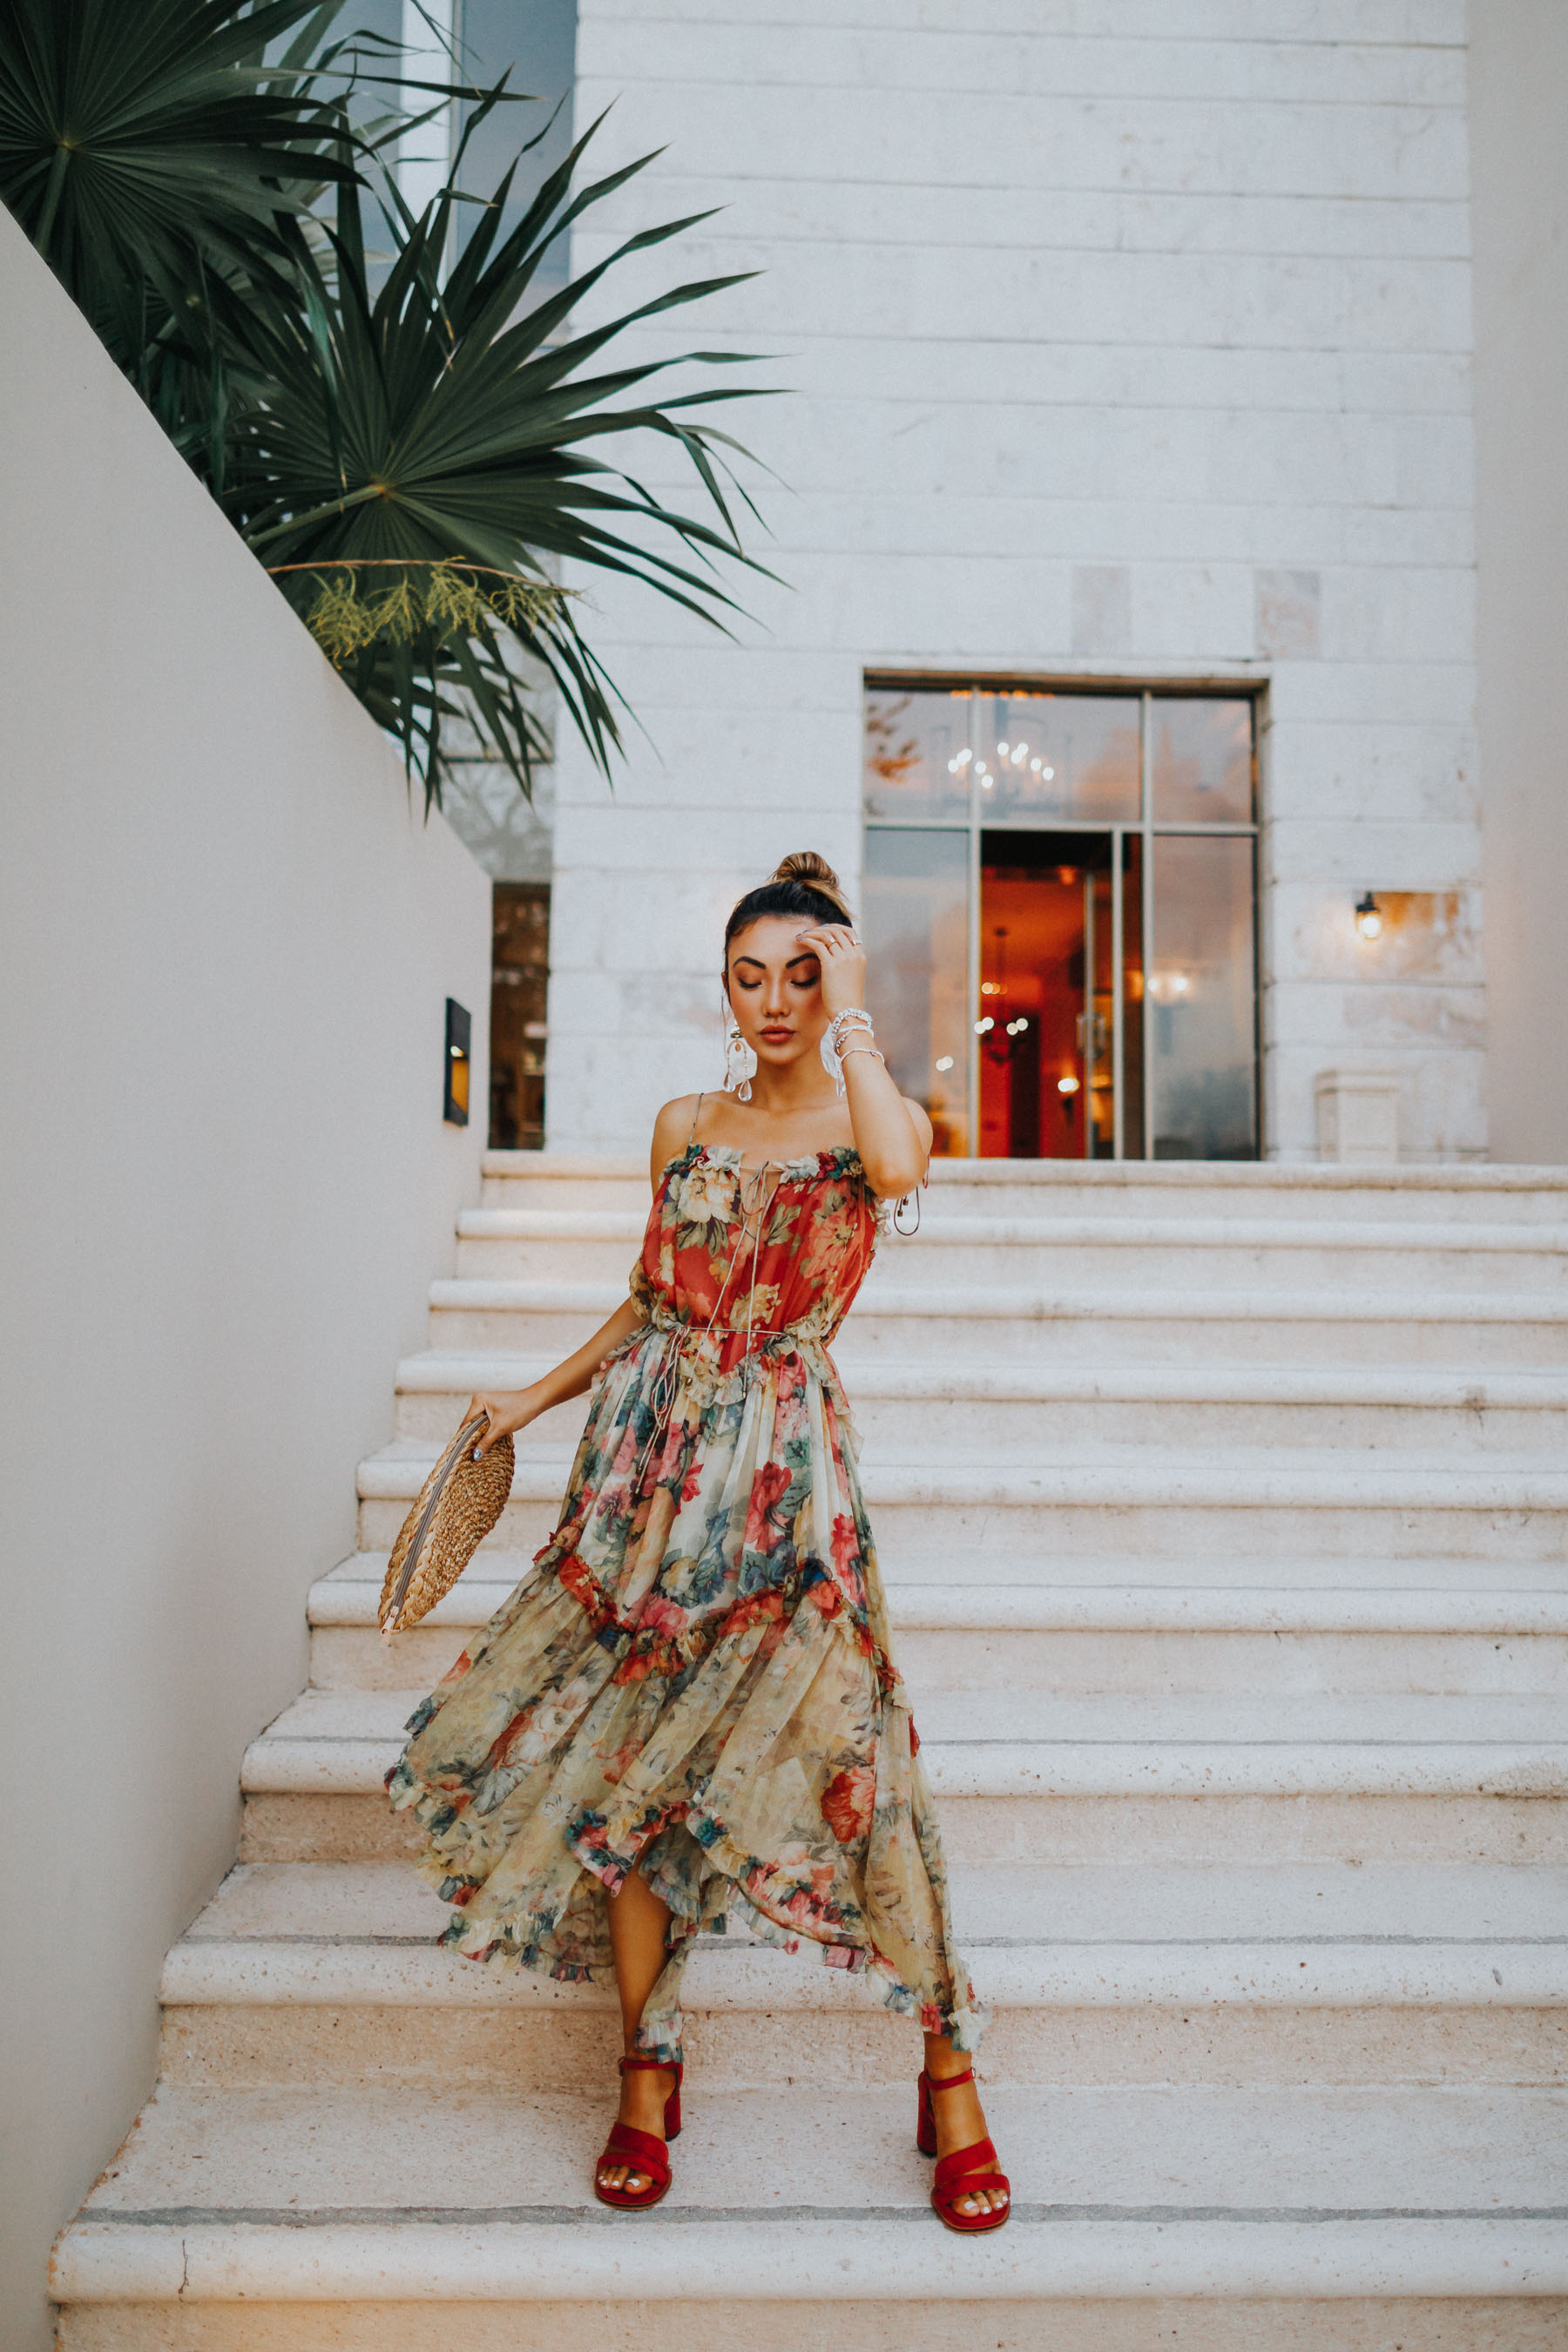 Fairmont Mayakoba x LIKEtoKNOW.it - Zimmerman dress, vacation style // Notjessfashion.com